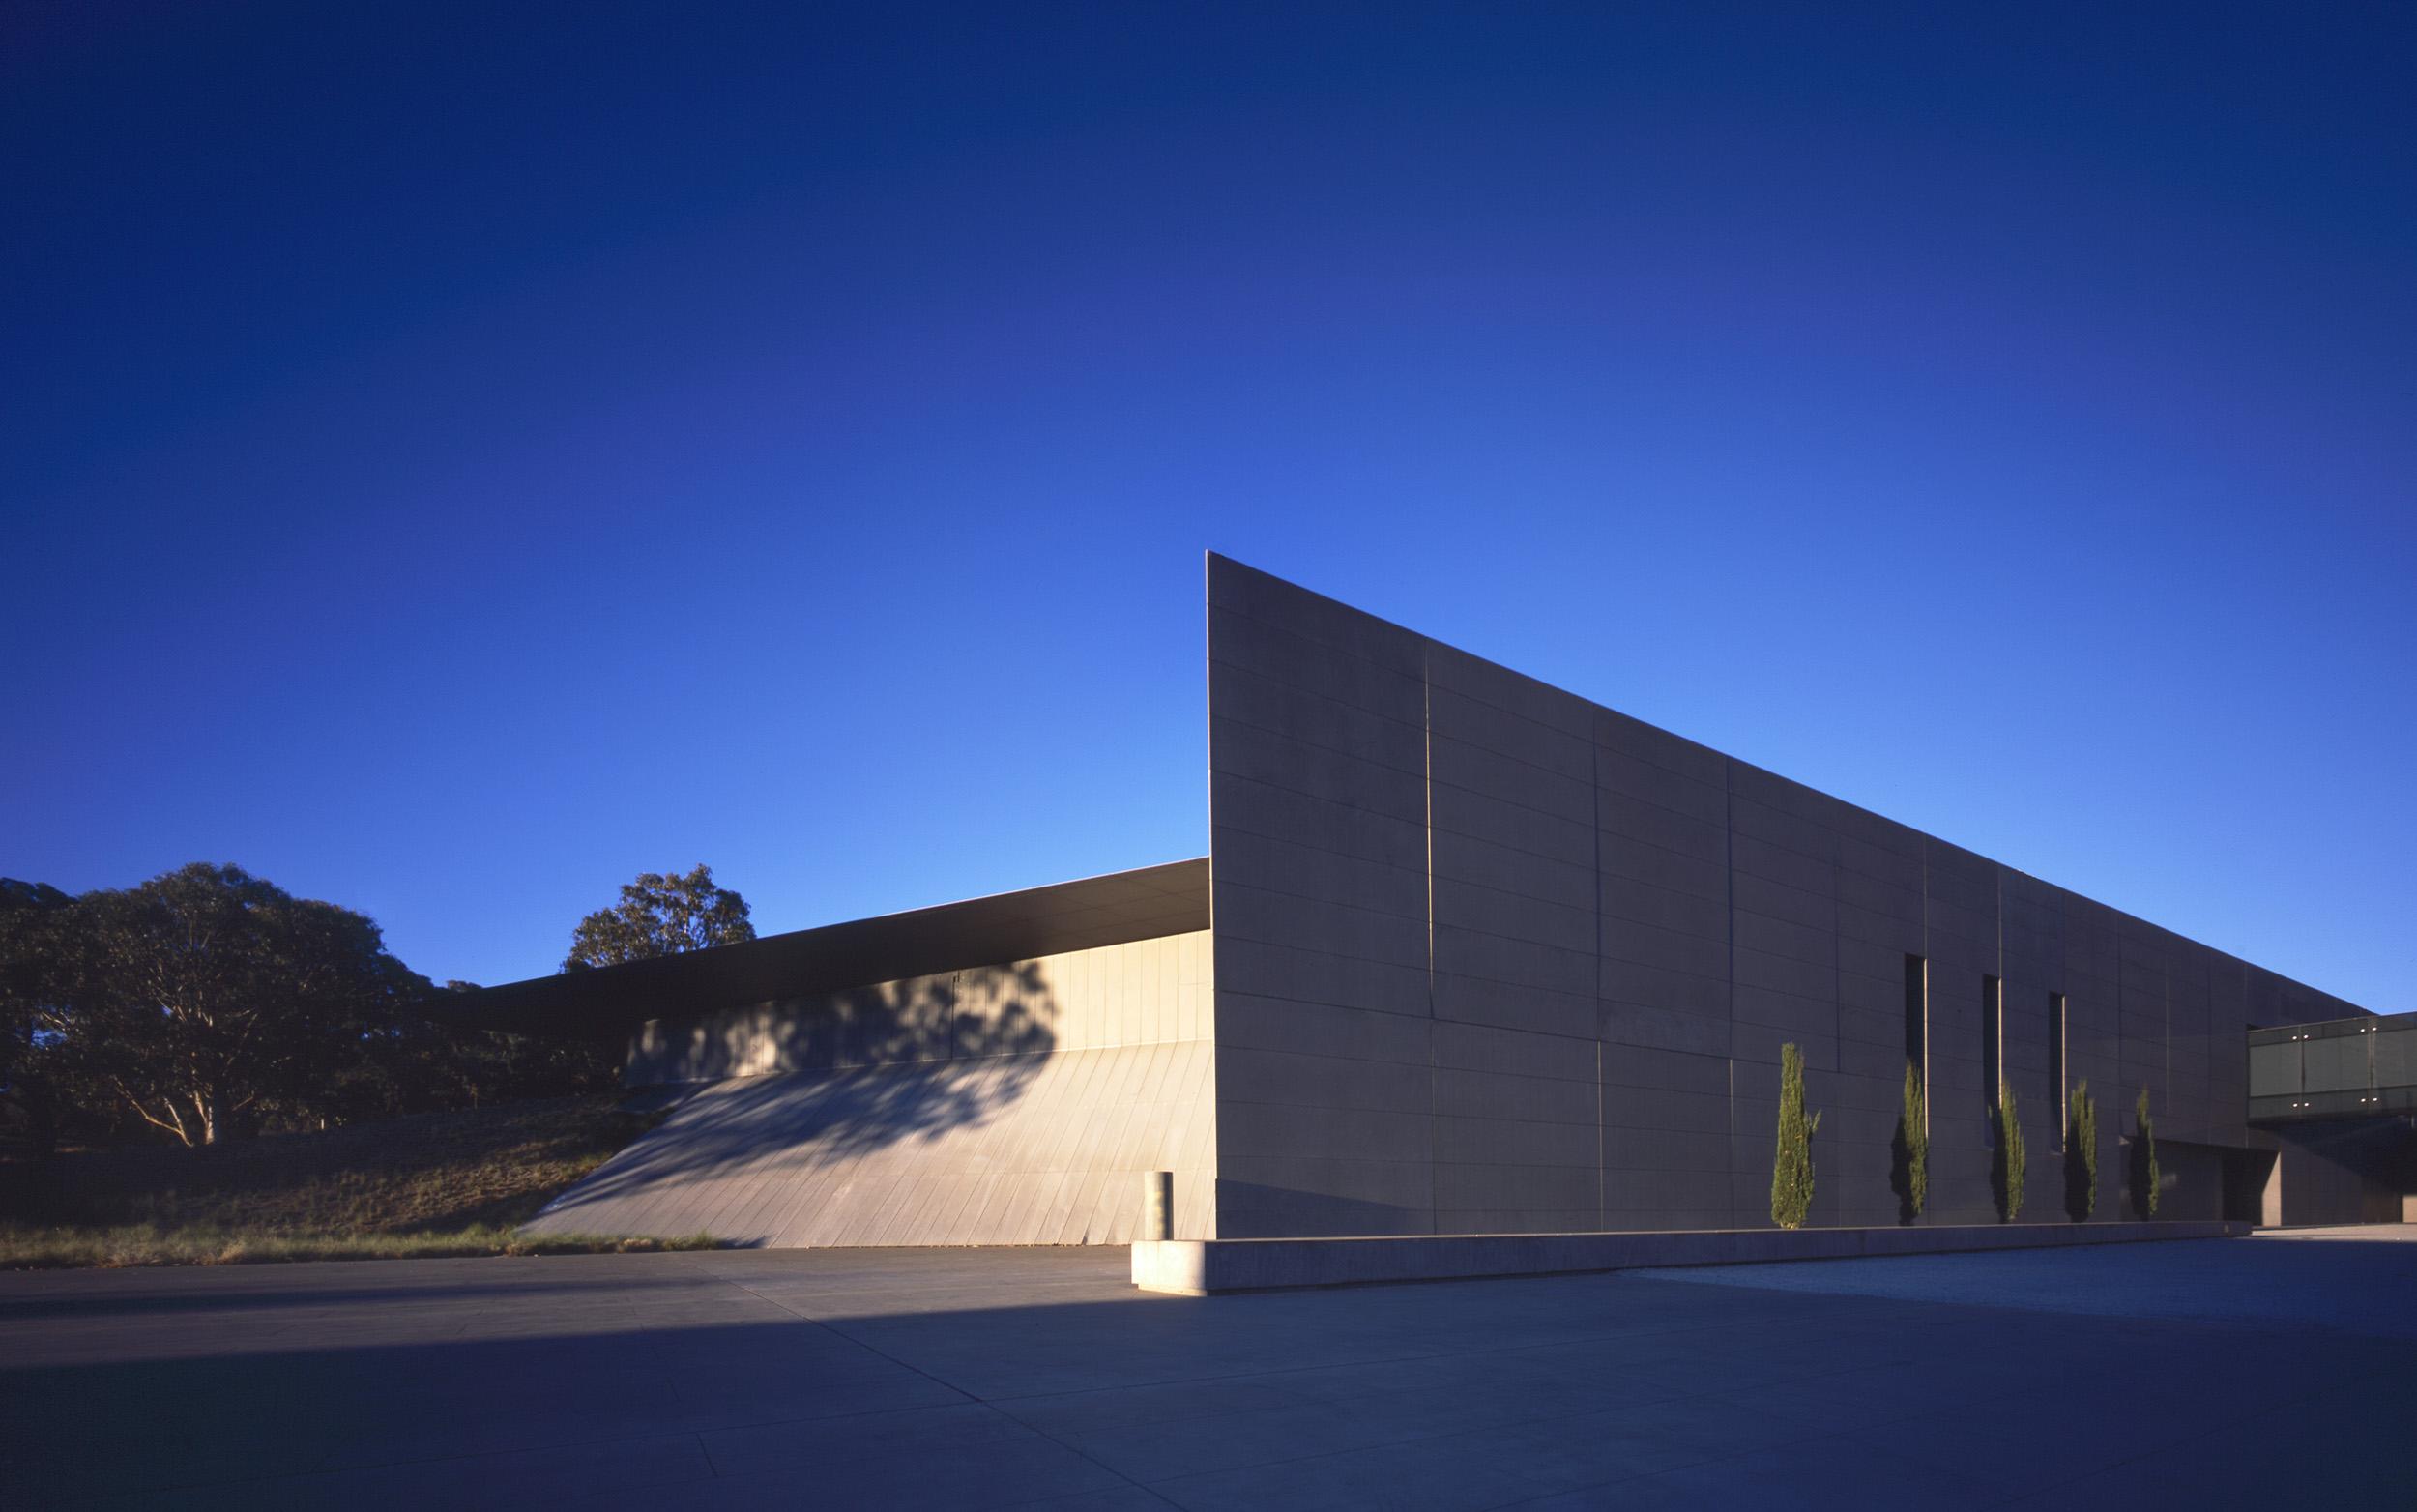 ANZAC HALL, CANBERRA